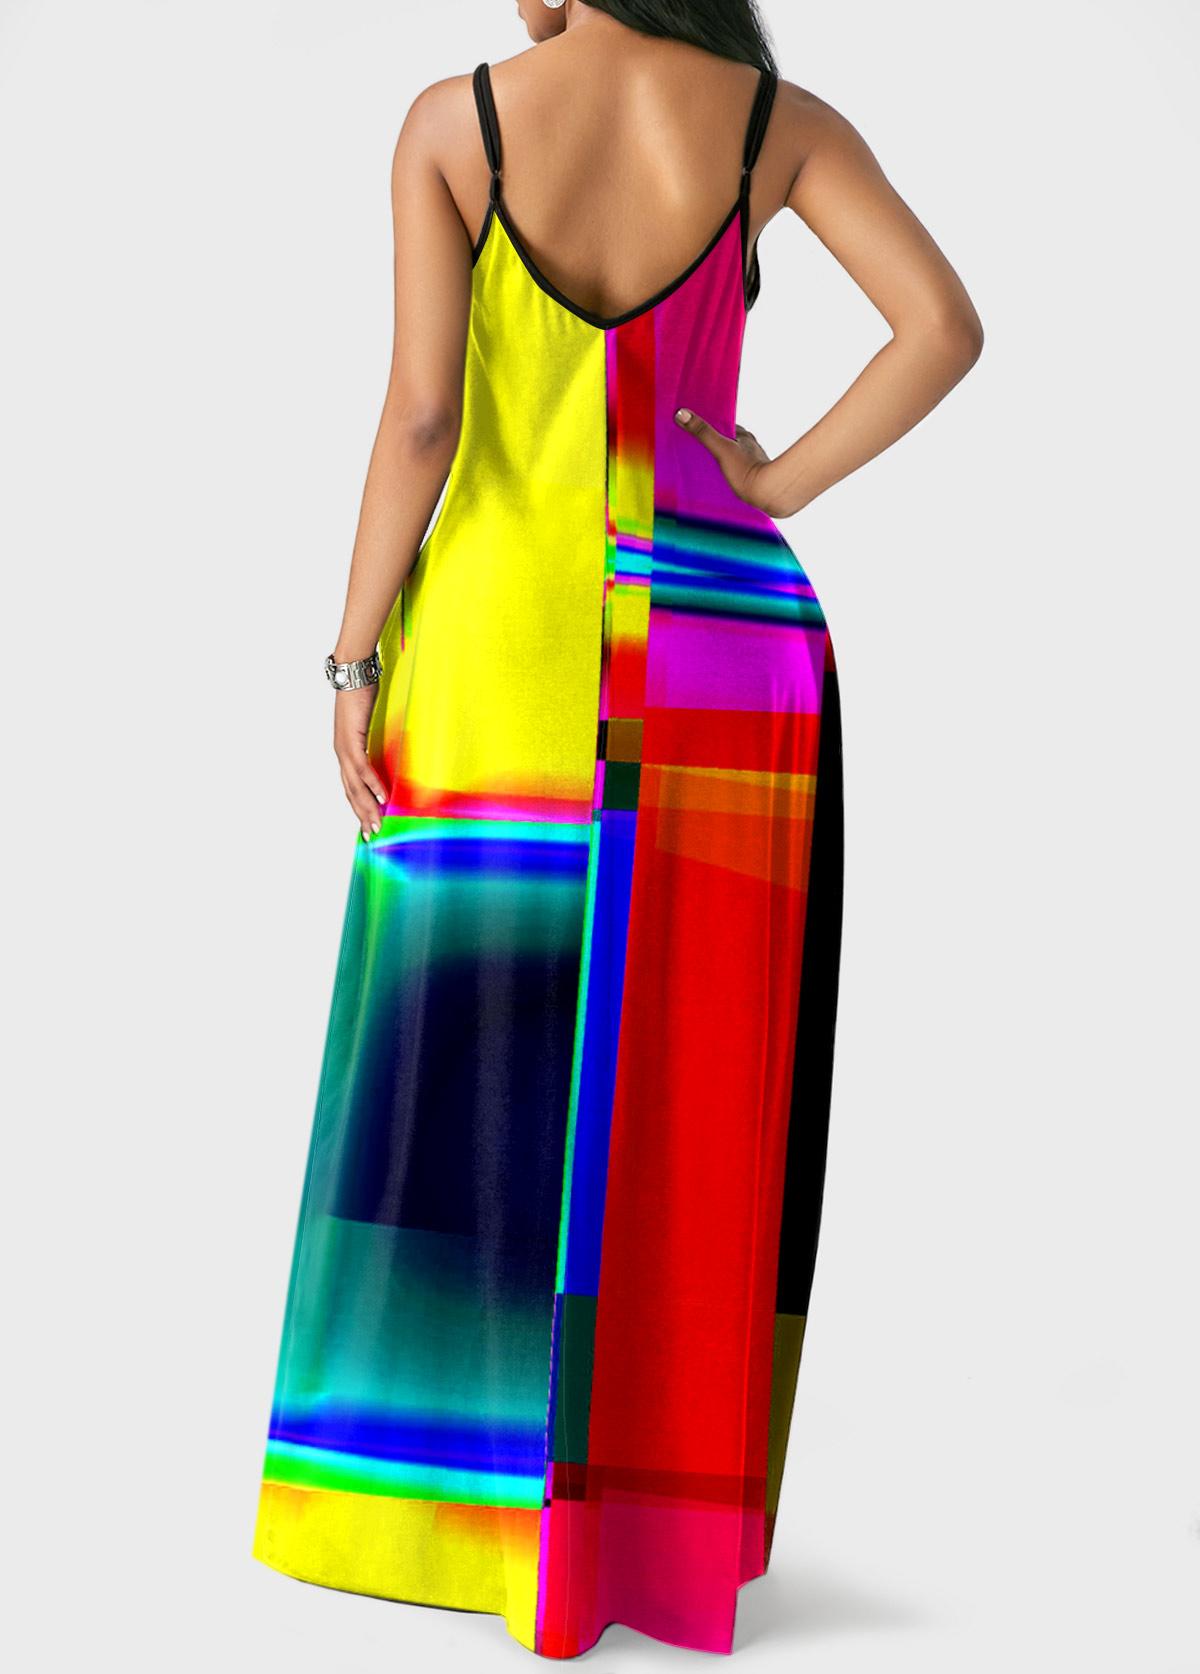 Colorful Geometric Print Spaghetti Strap Dress